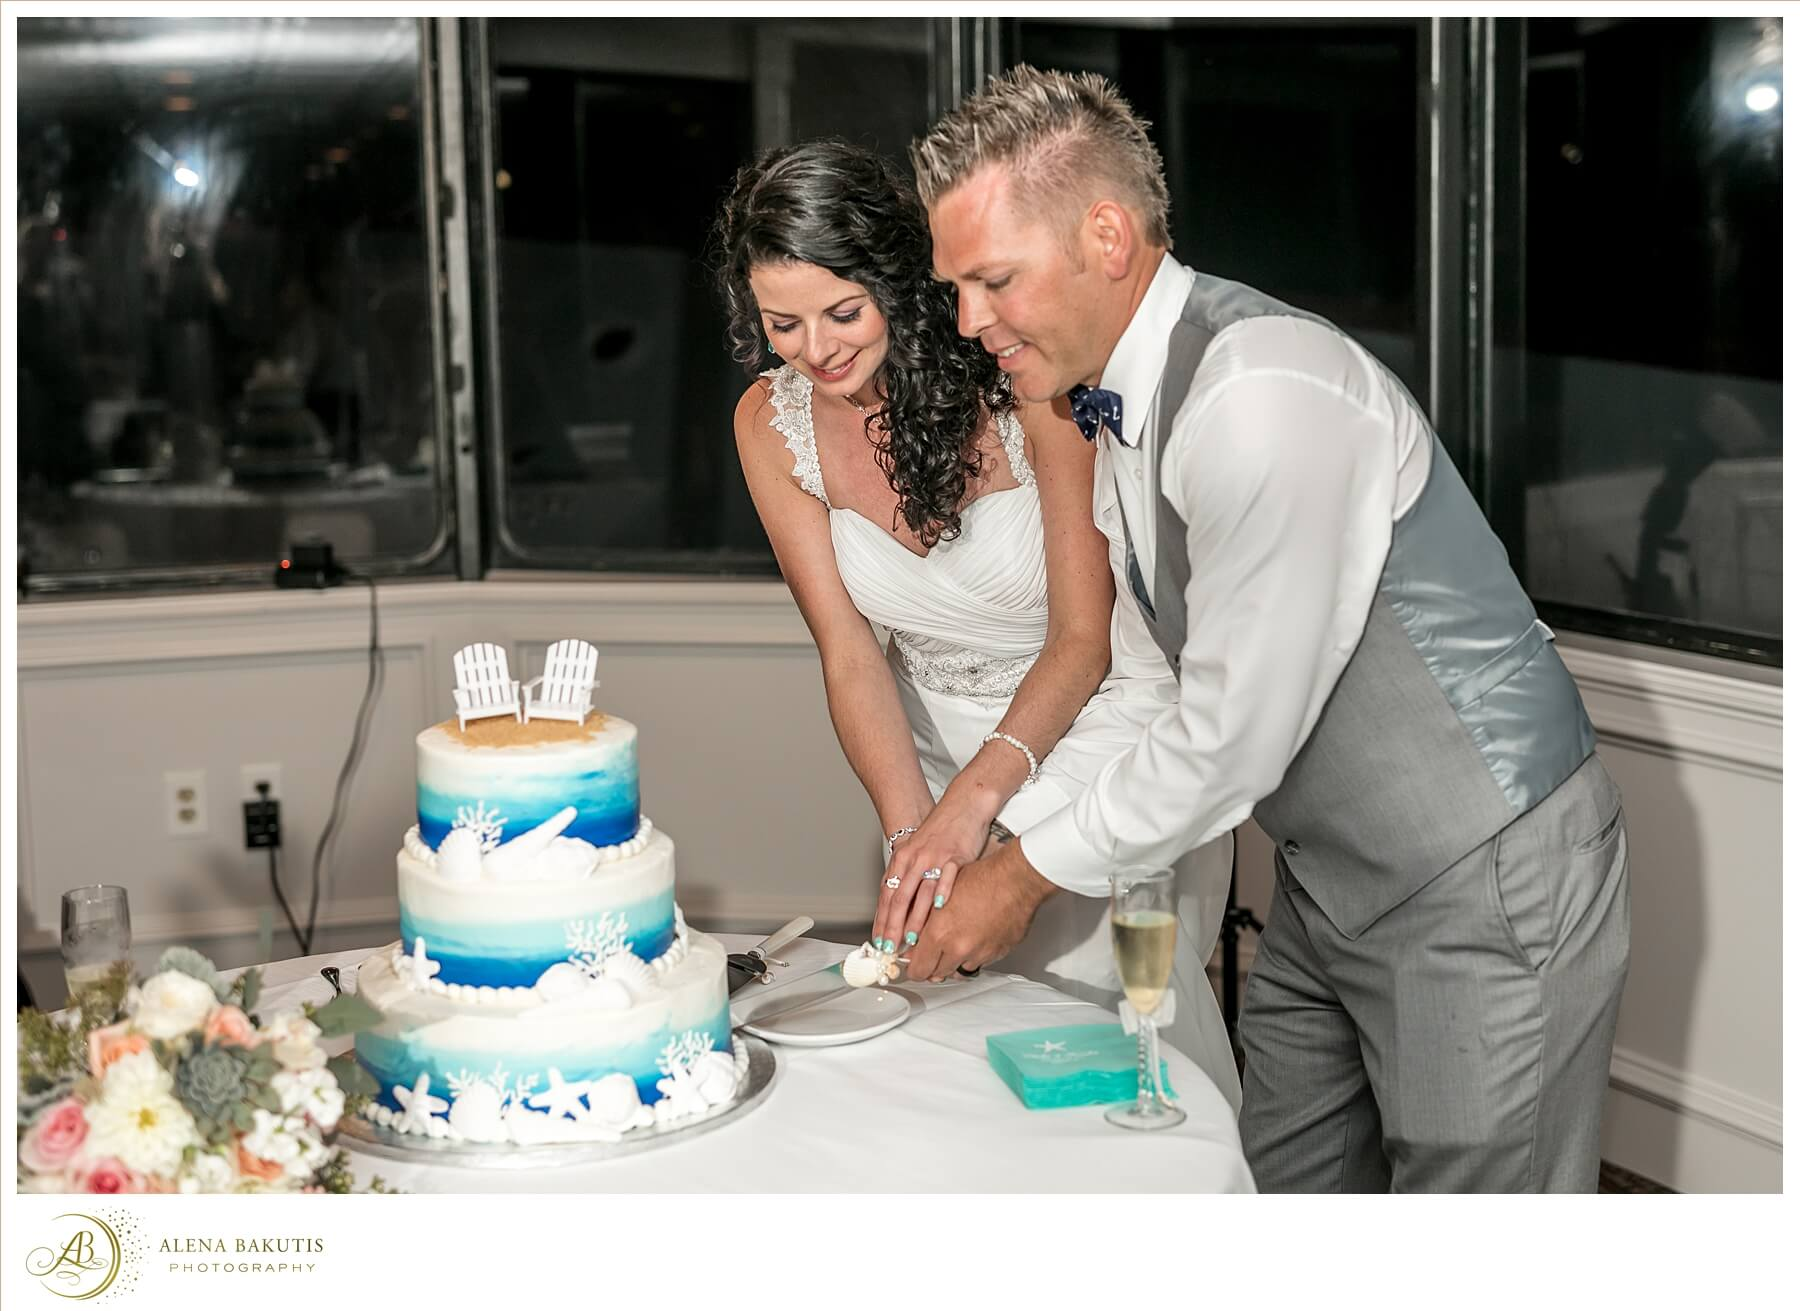 destin wedding venues Alena Bakutis Photography - Amber Brandon-678_WEB